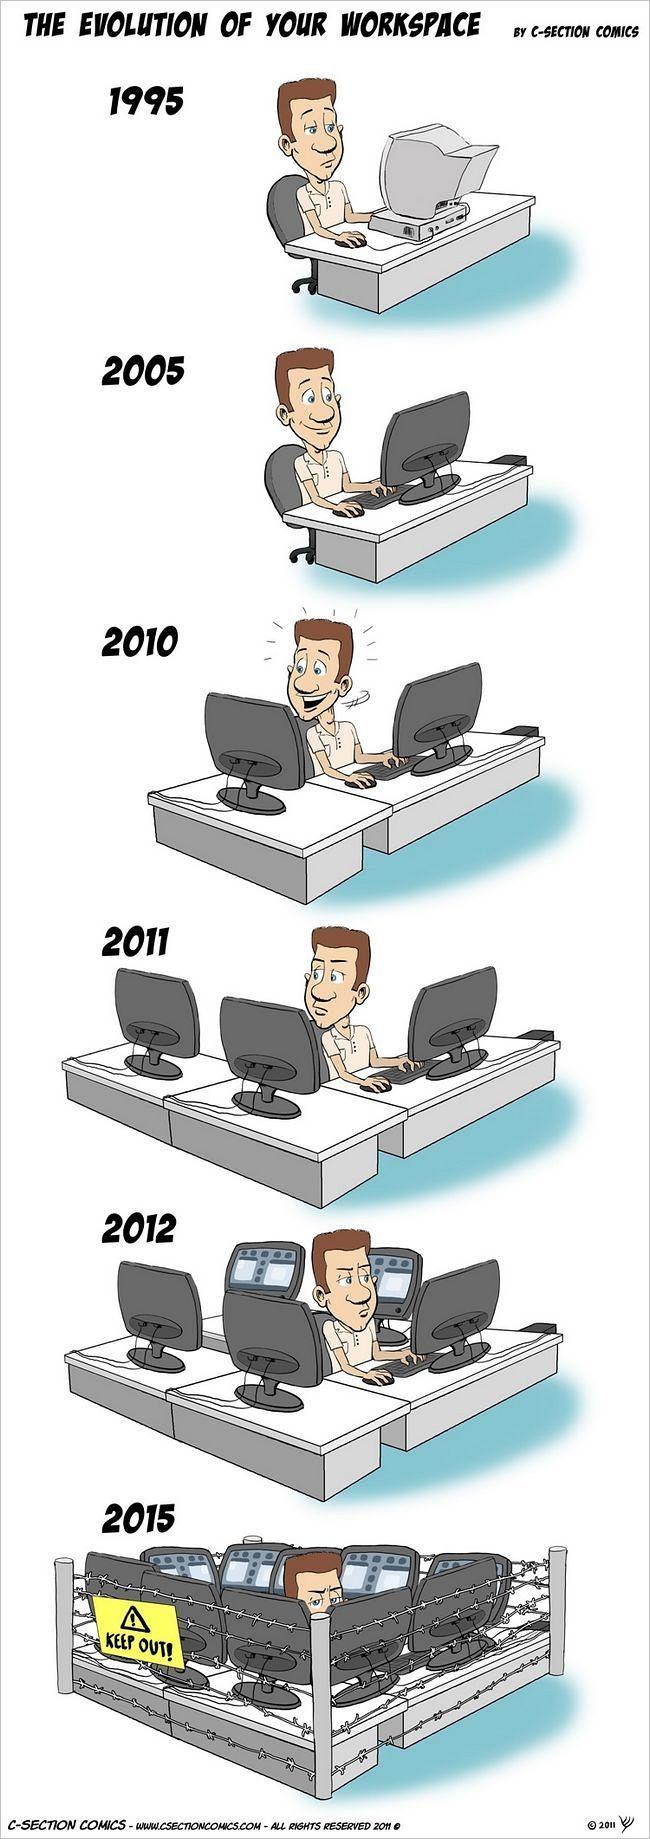 Harvard hgse computer tables flickr photo sharing - The Evolution Of Desktop Workspace Comic